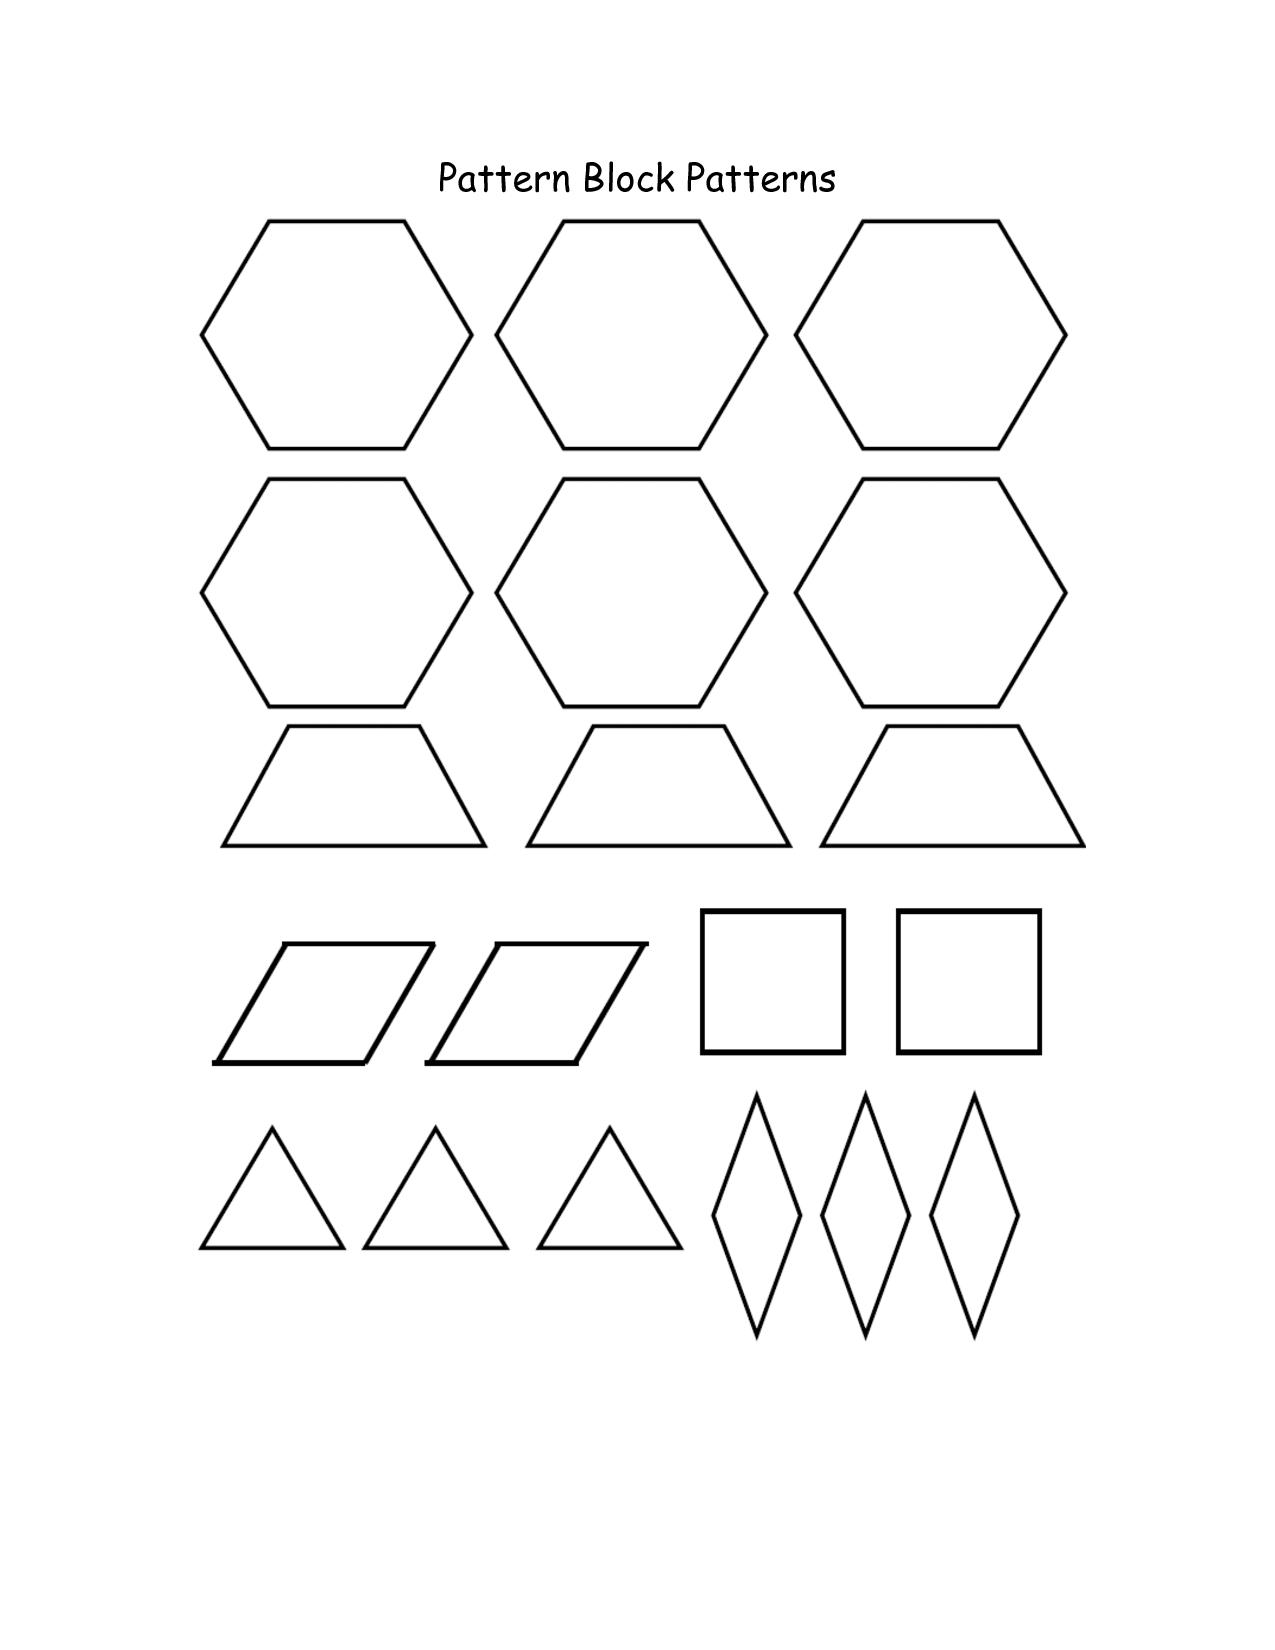 Pattern Block Templates E Commercewordpress 8oe3ggmo